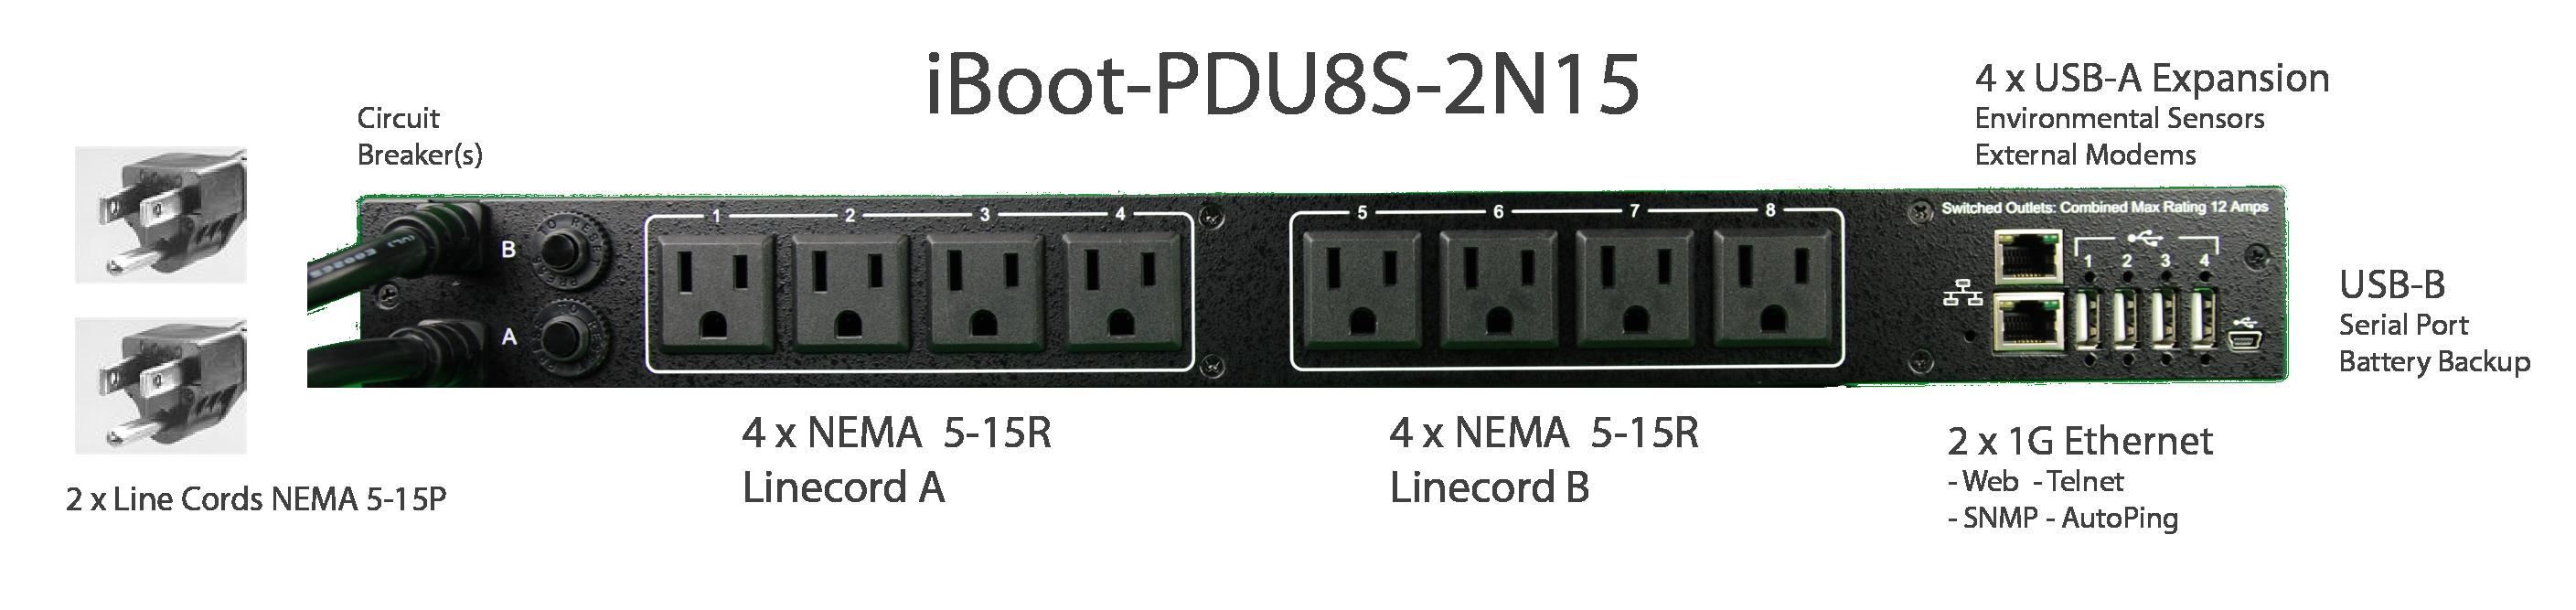 iBoot-PDU8S-2N15 for Remote Reboot, 2 x NEMA 5-15P.